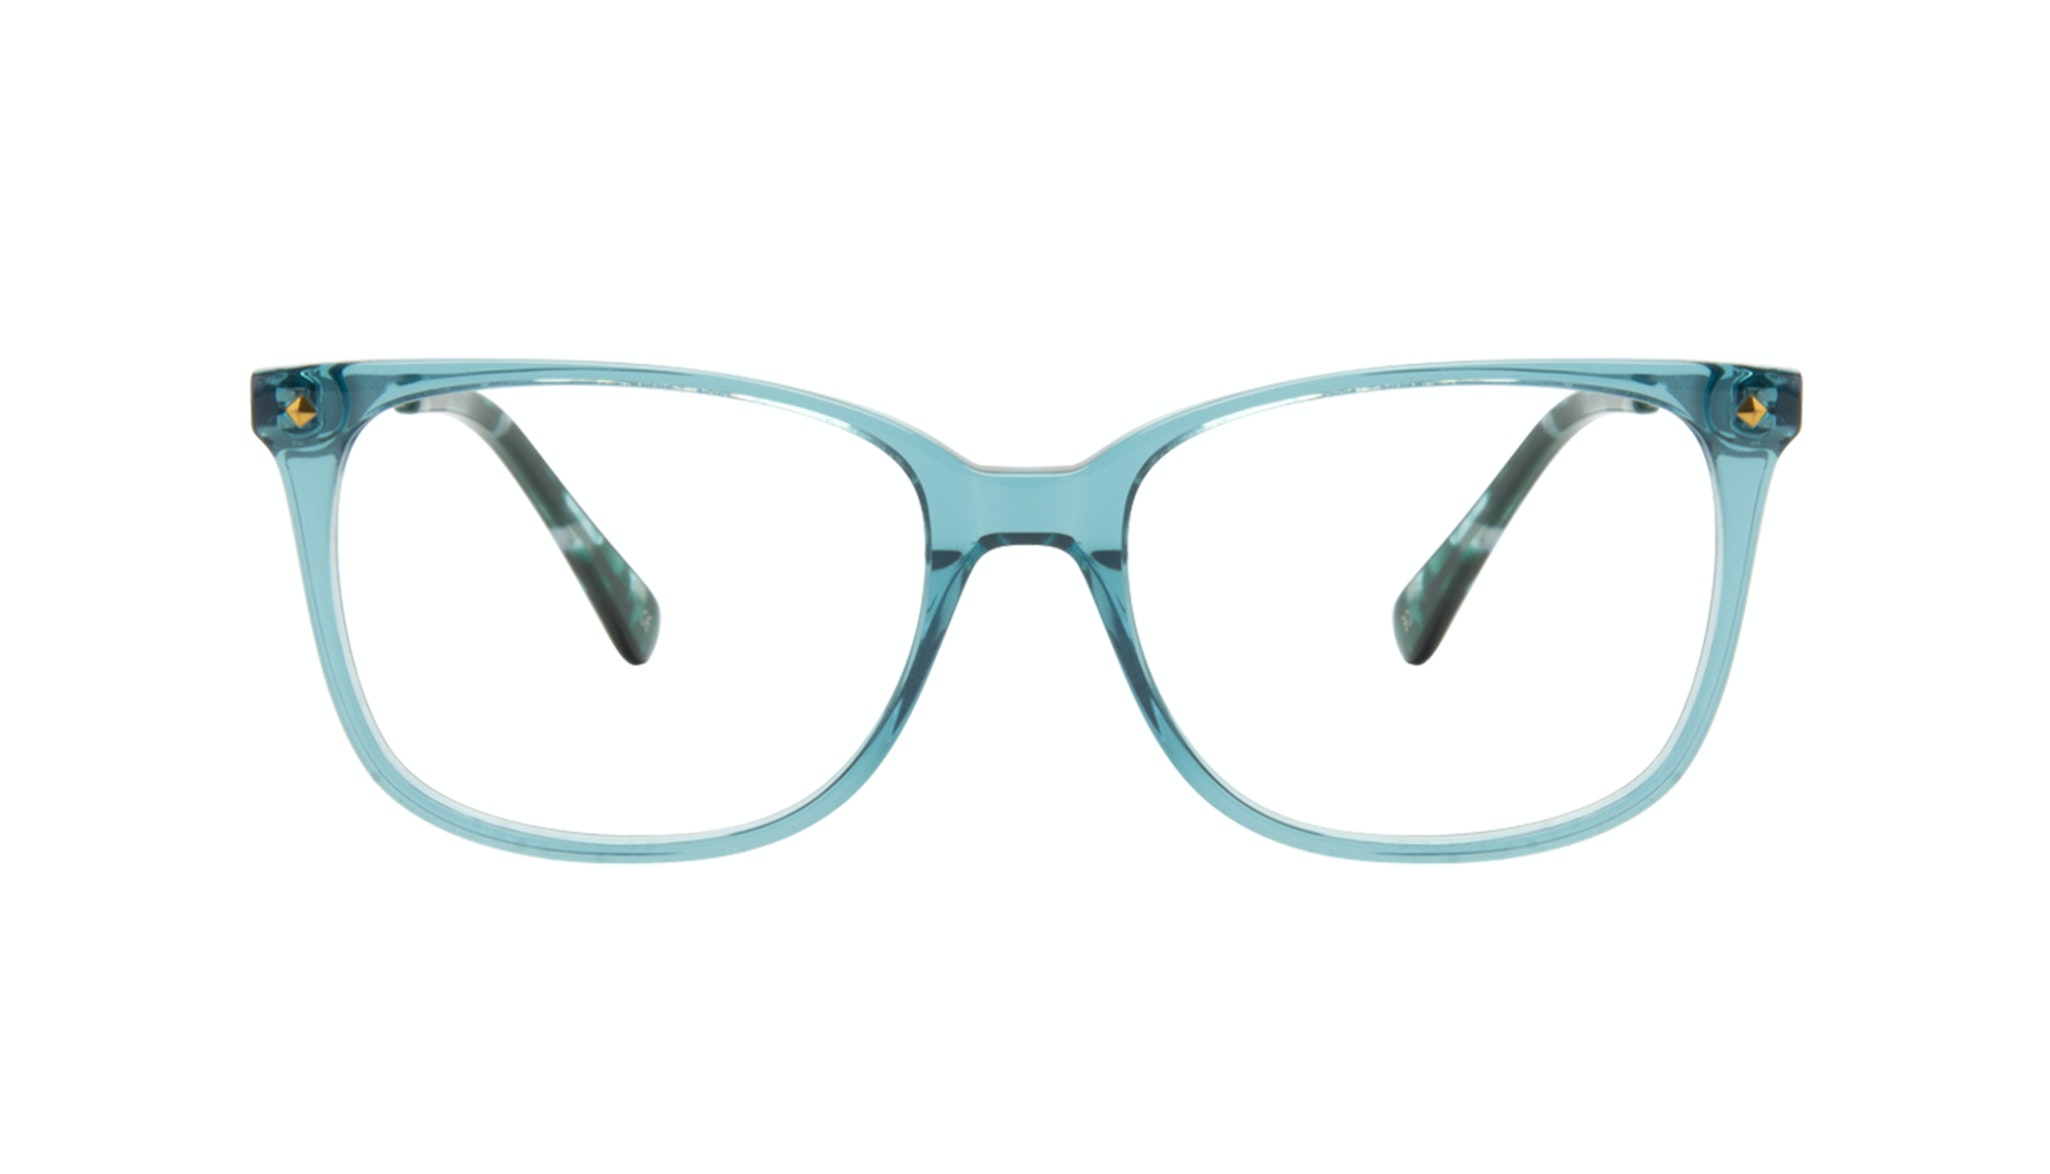 Affordable Fashion Glasses Rectangle Square Eyeglasses Women Refine Teal